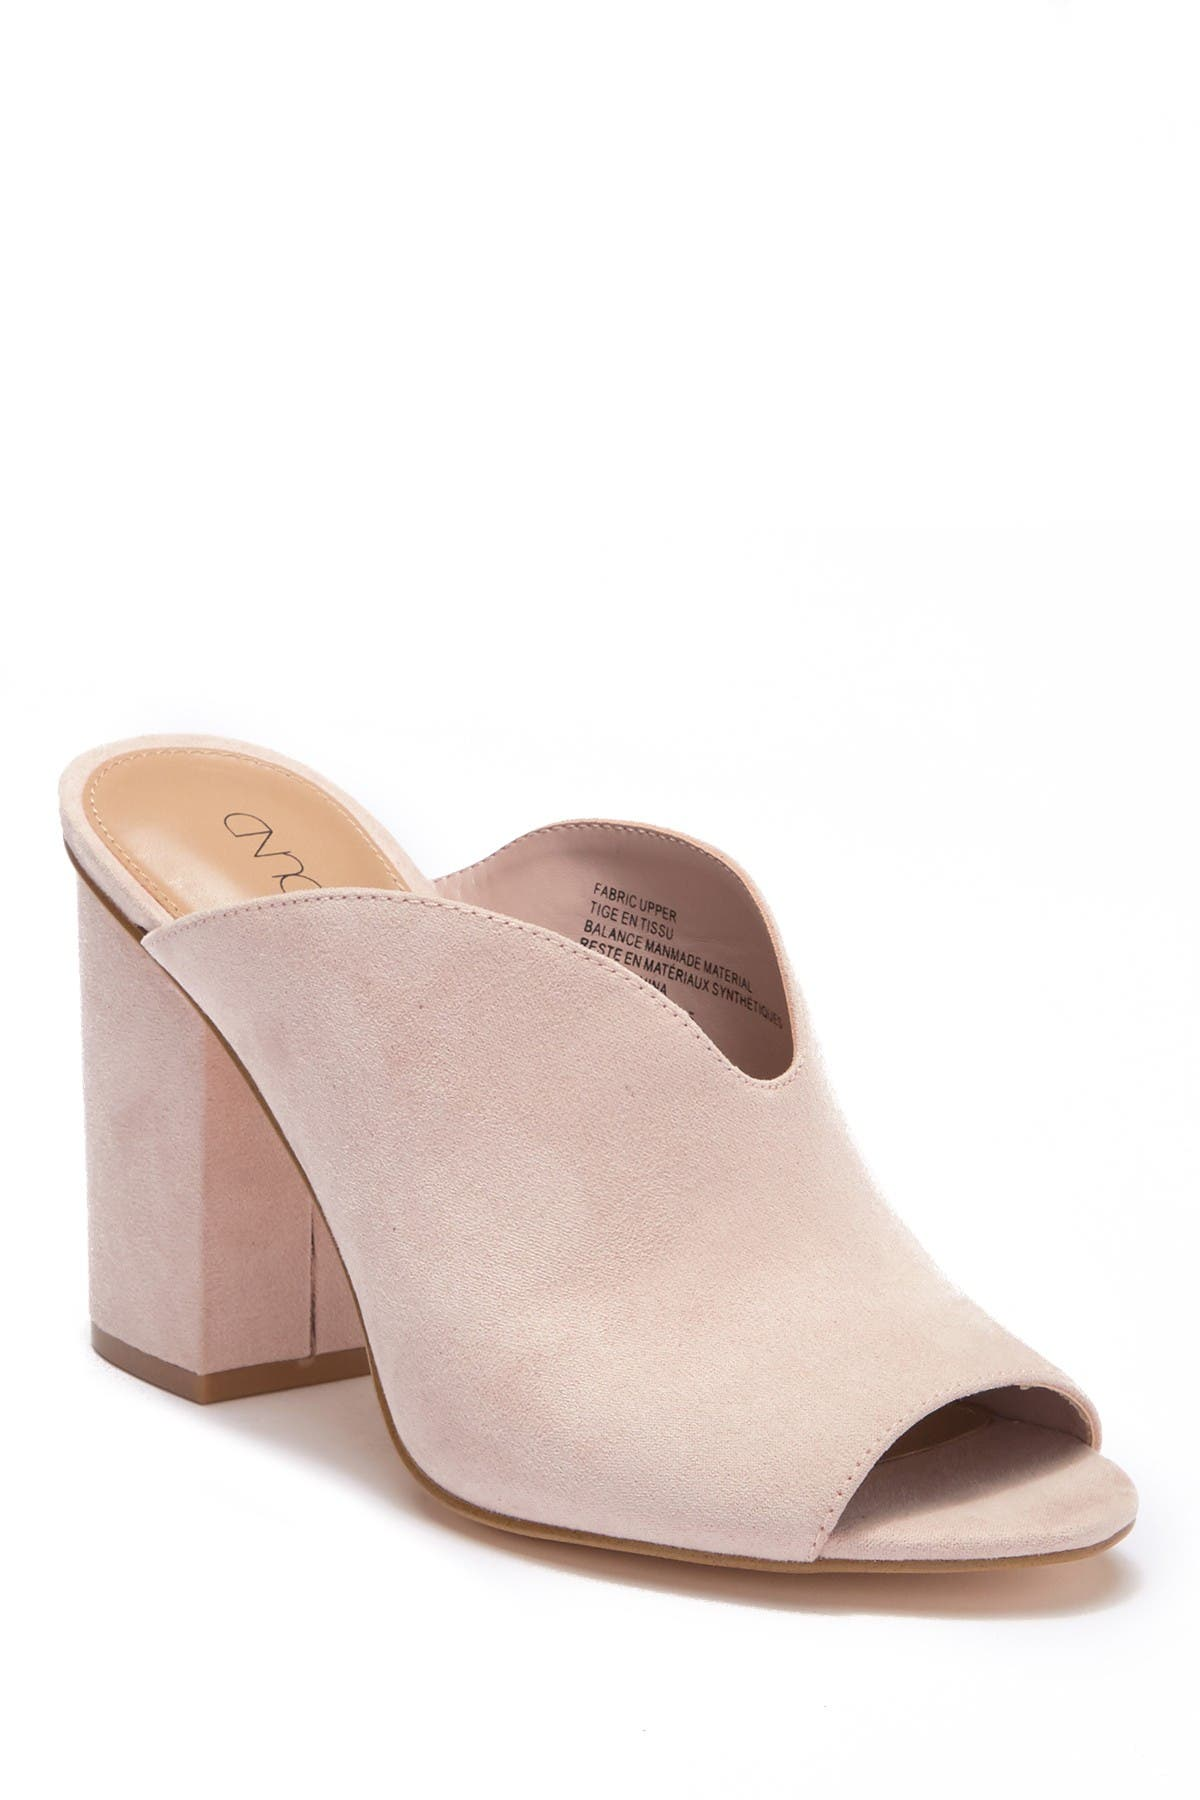 Image of Abound Tyla Block Heel Heel Mule